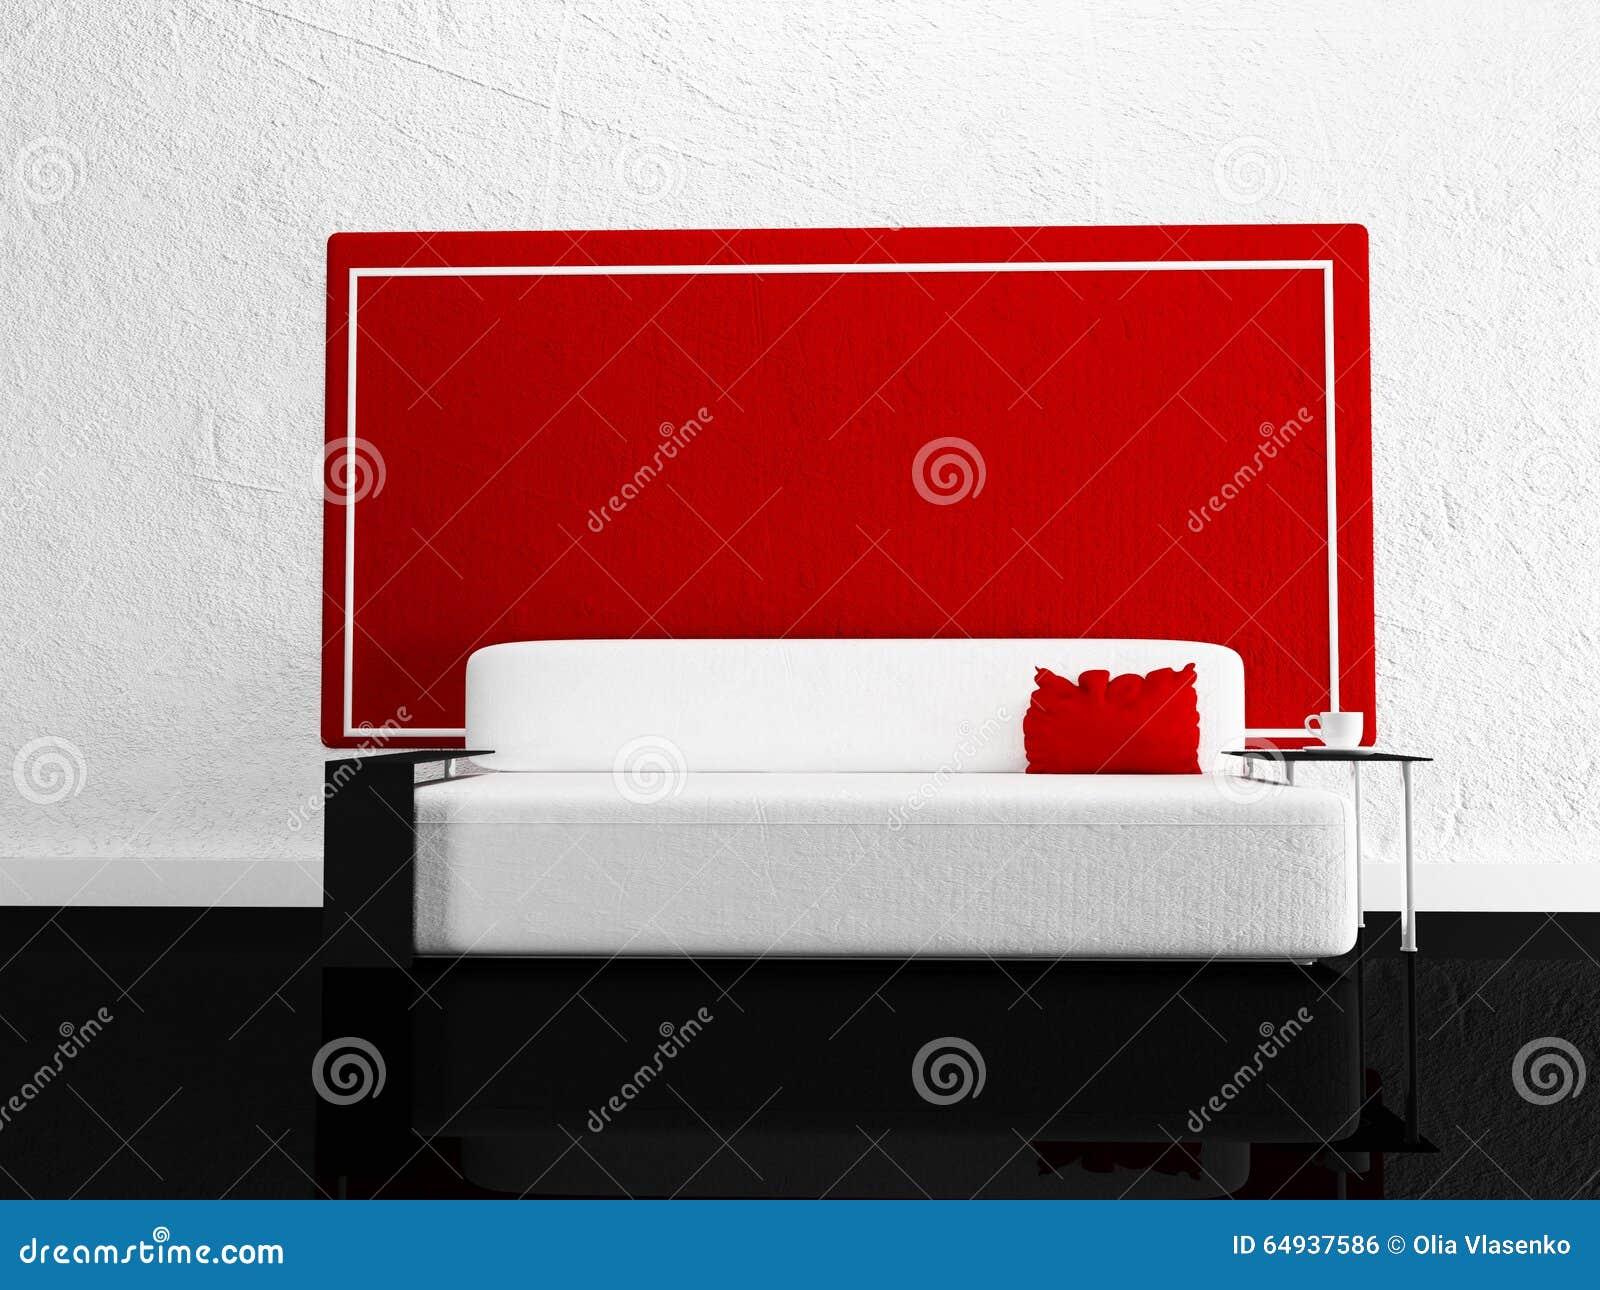 Modernes sofa im raum stock abbildung bild von bequem for Sofa im raum